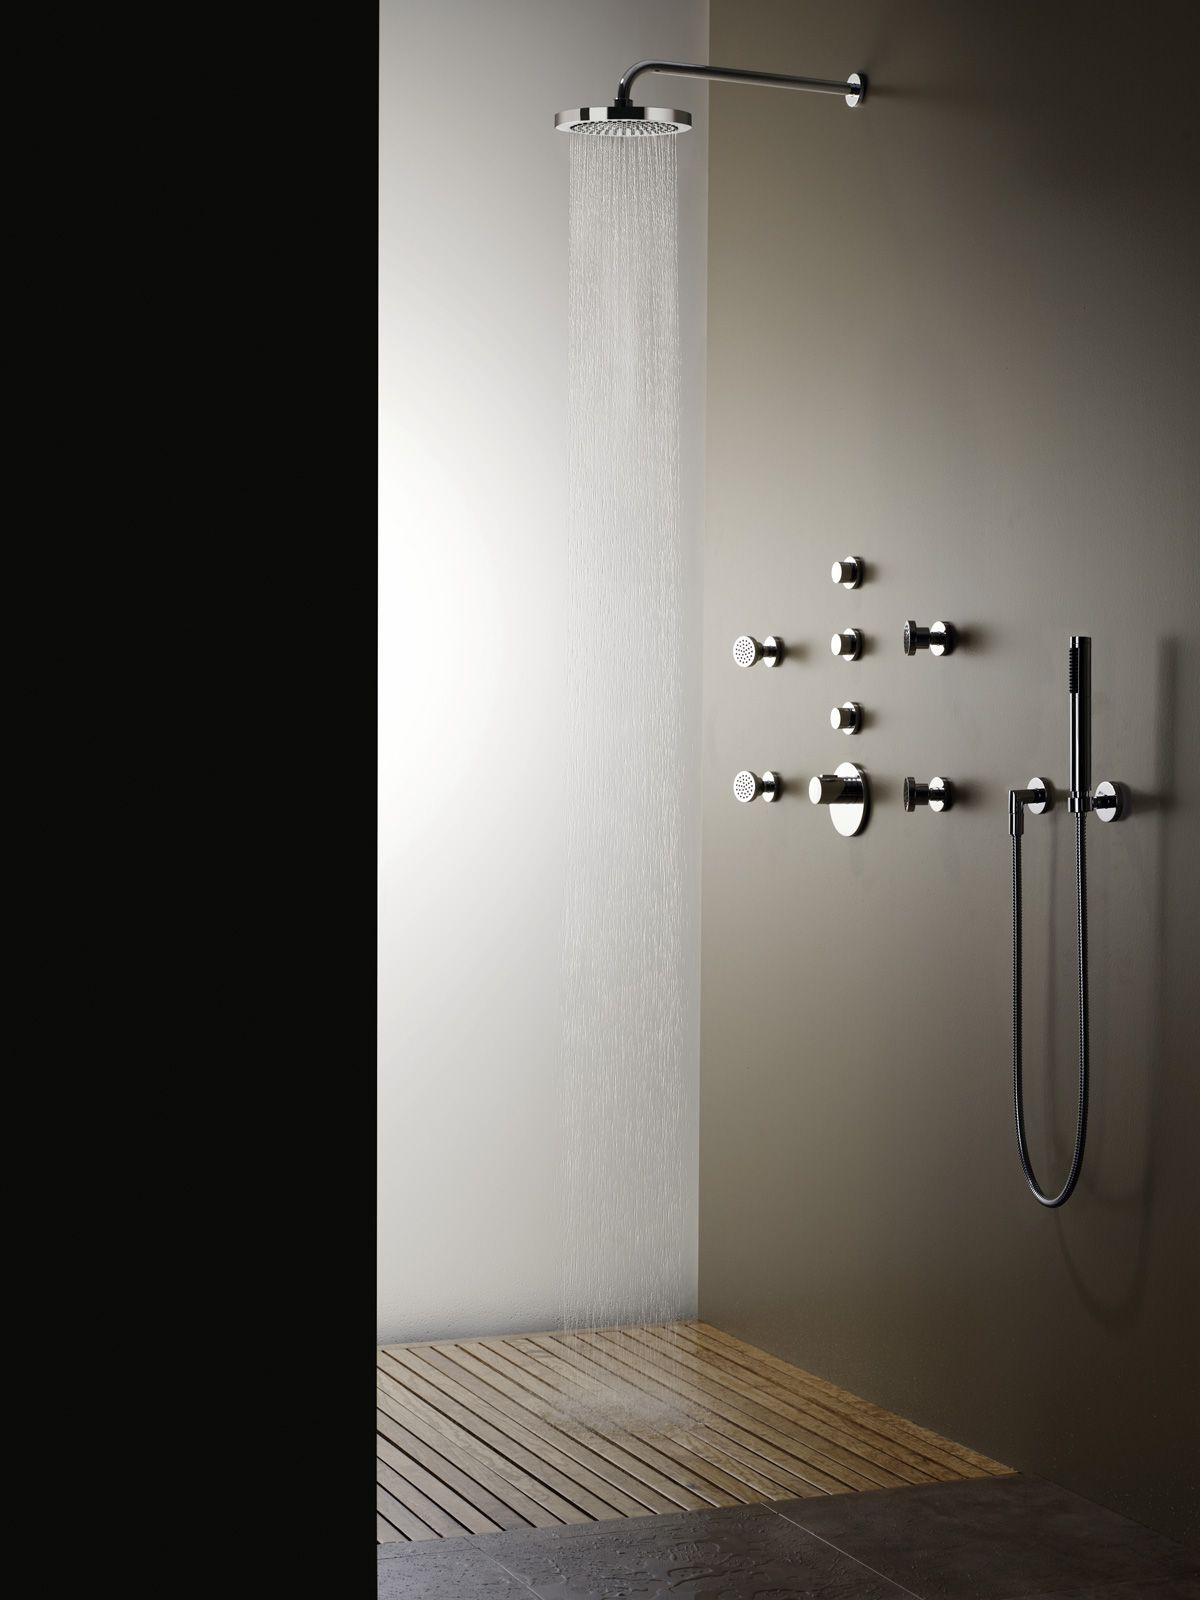 Meta02  Bath  Spa  fitting  Dornbracht body sprays